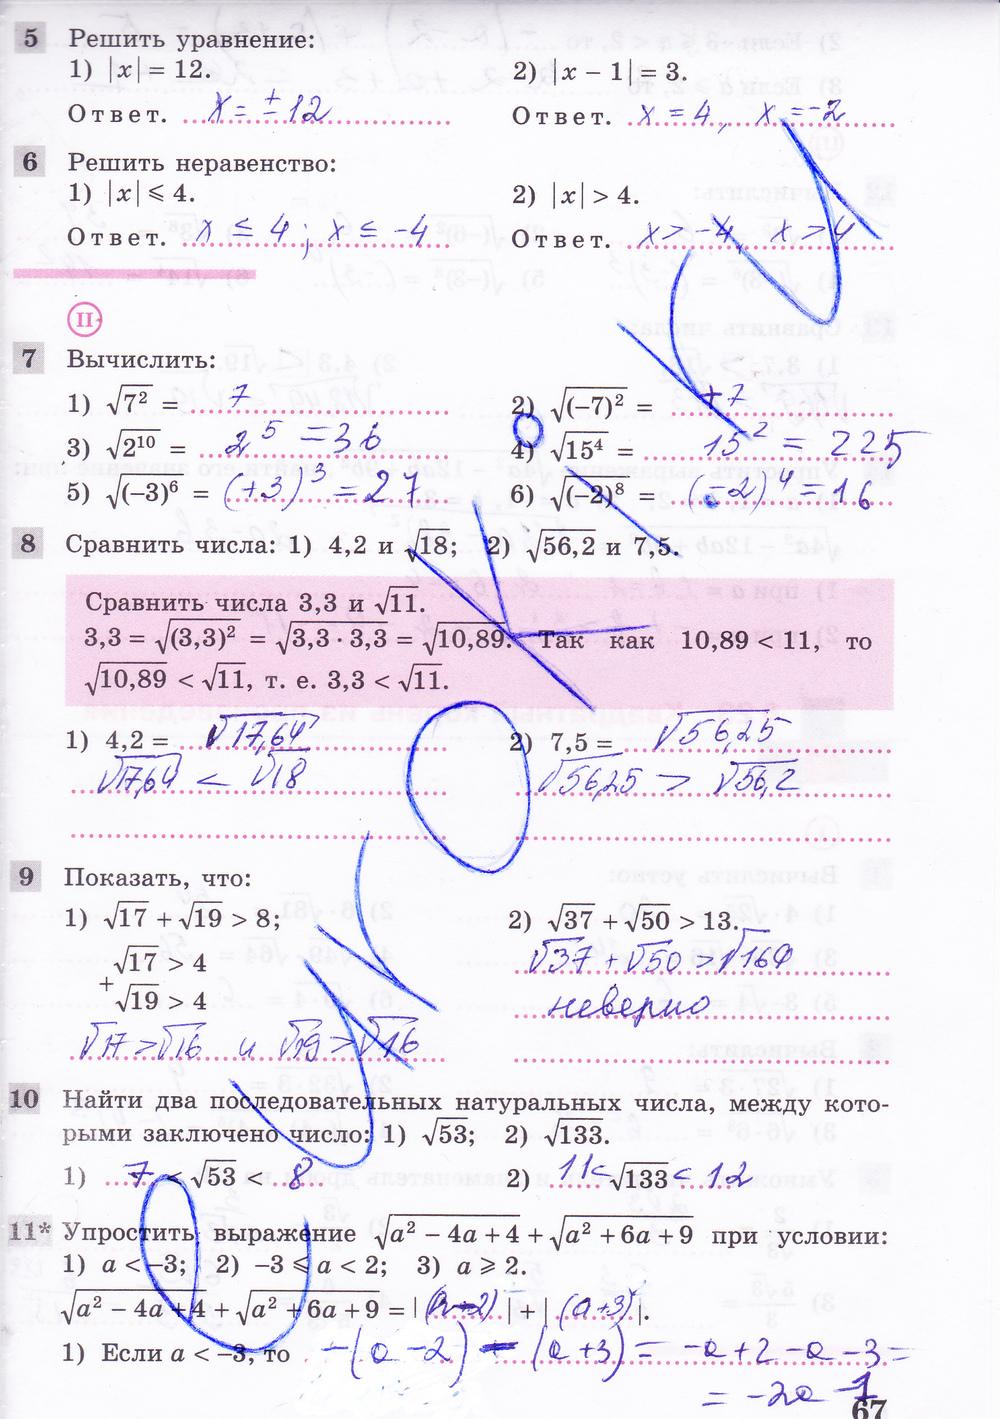 рт алгебре класс 7 рт колягин гдз по